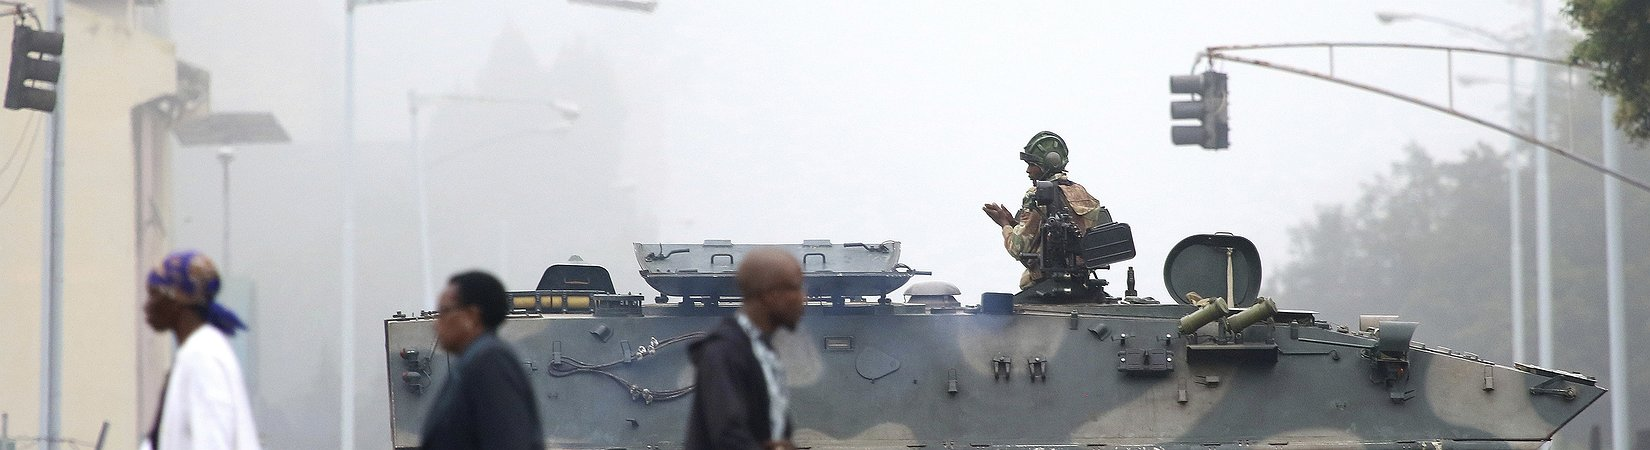 Tensão política intensifica-se no Zimbabwe